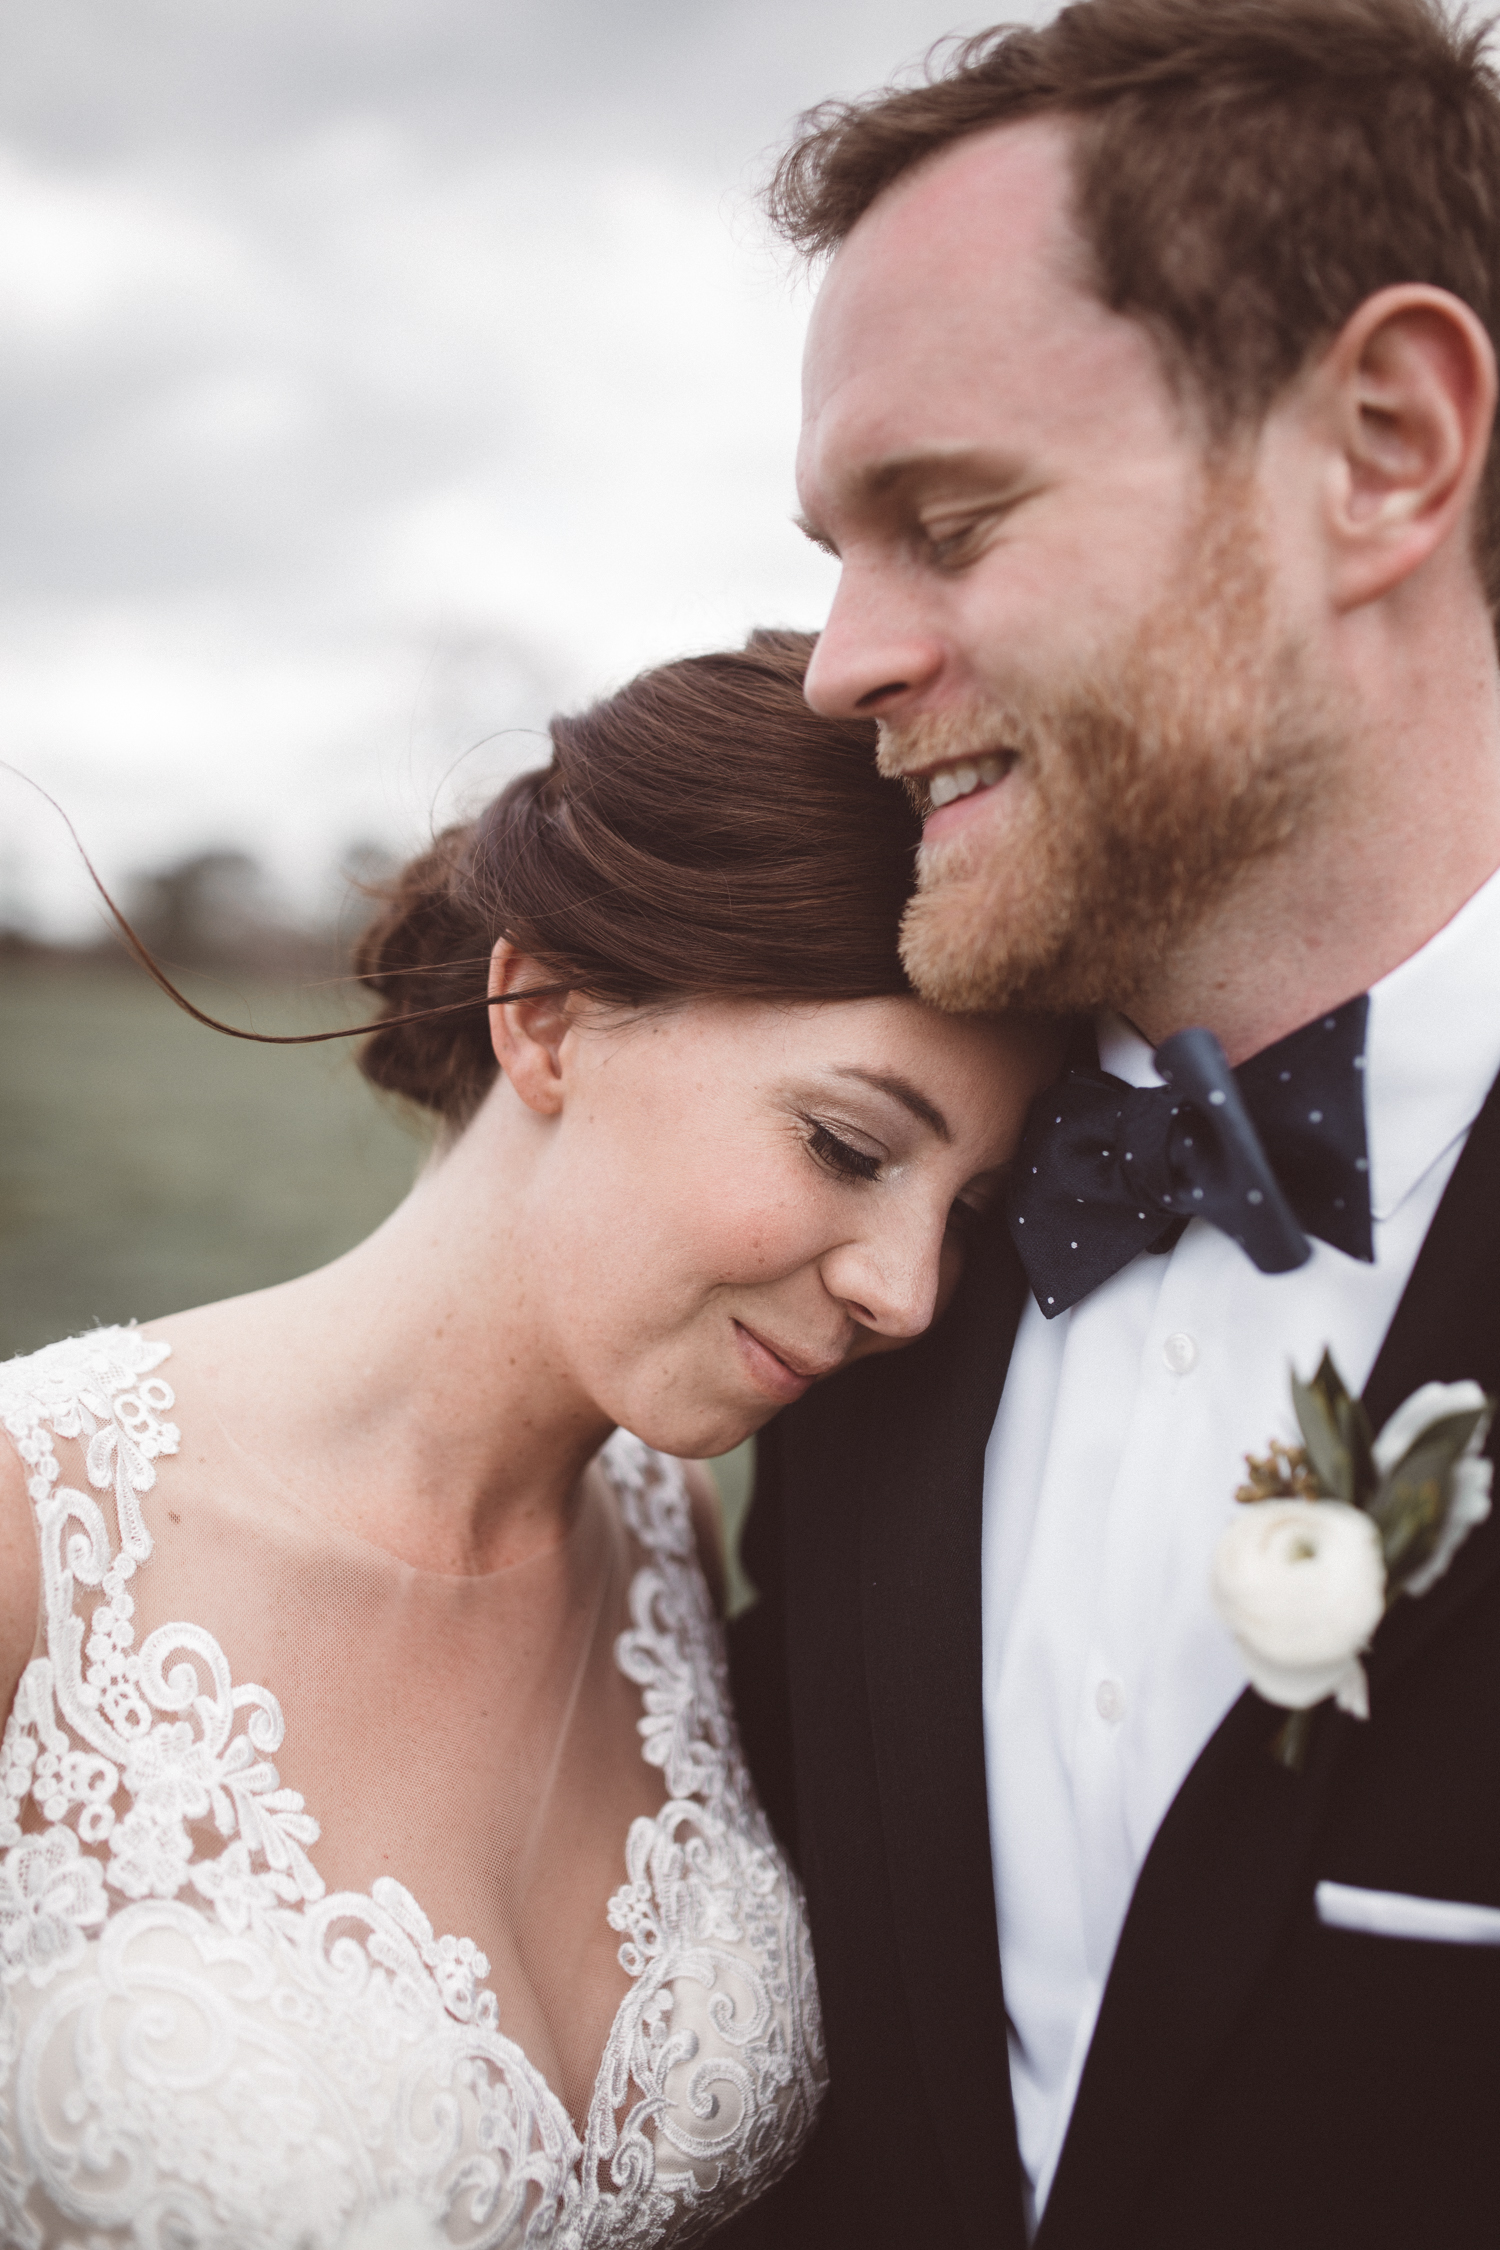 KDP_lindsey&taylor_wedding-280.JPG